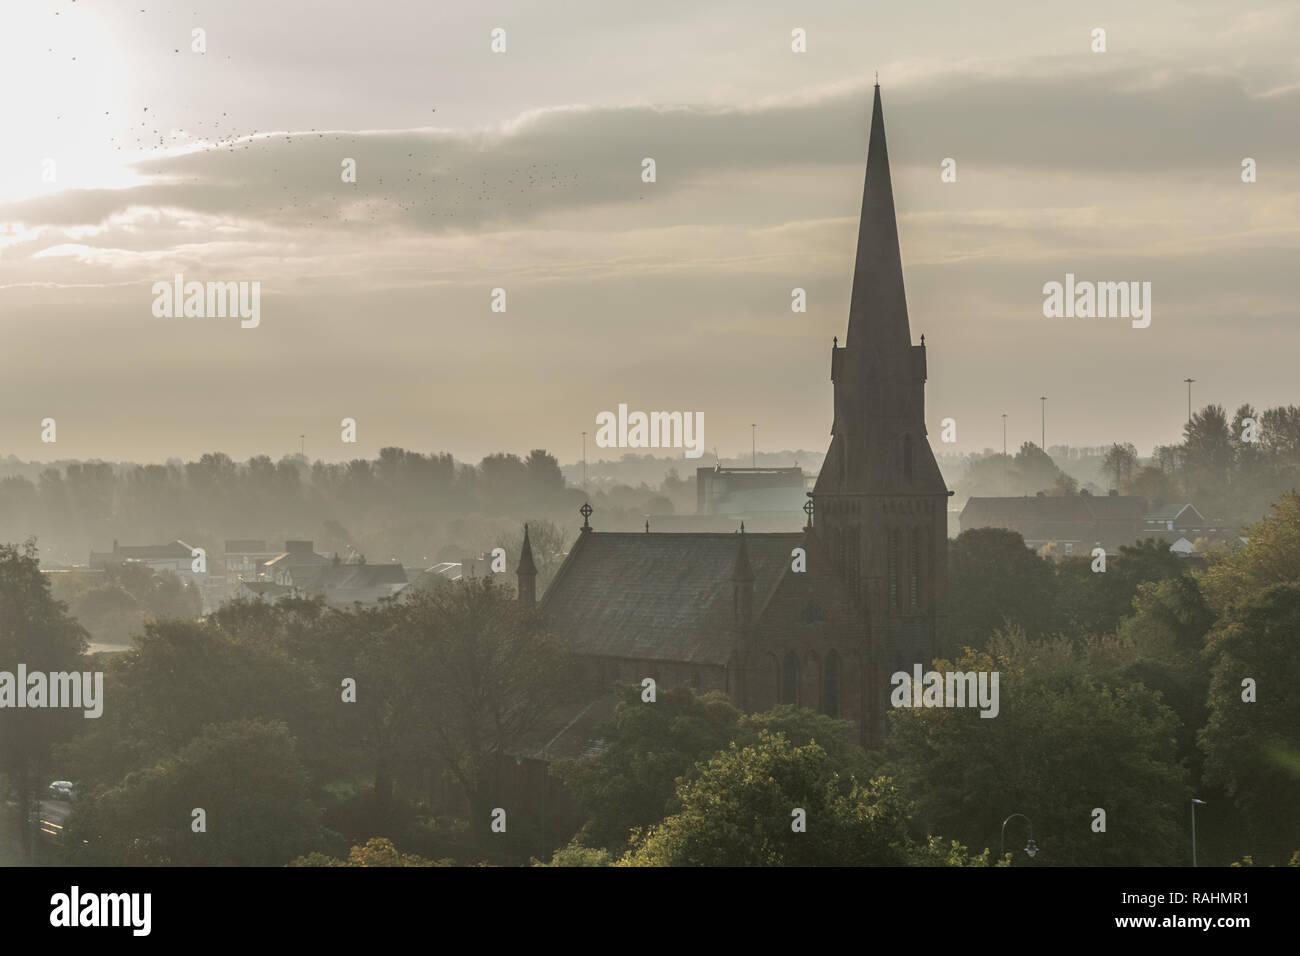 All Saints Church in Runcorn at day break, sun rise taken from the Silver Jubilee Bridge - Stock Image